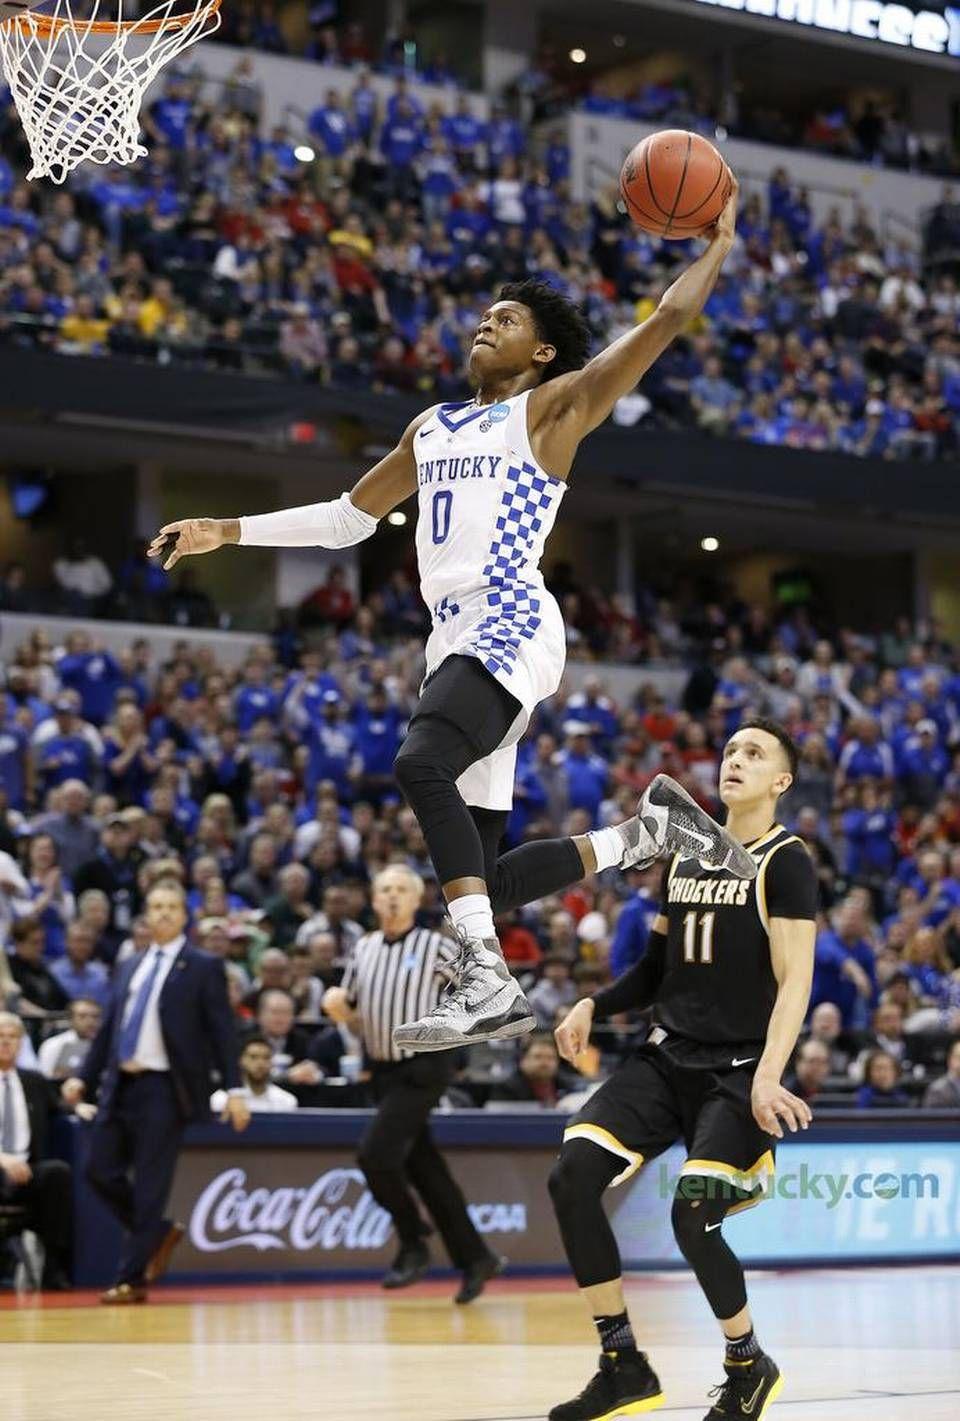 Kentucky Wildcats guard DeAaron Fox 0 soared to the basket on 960x1421